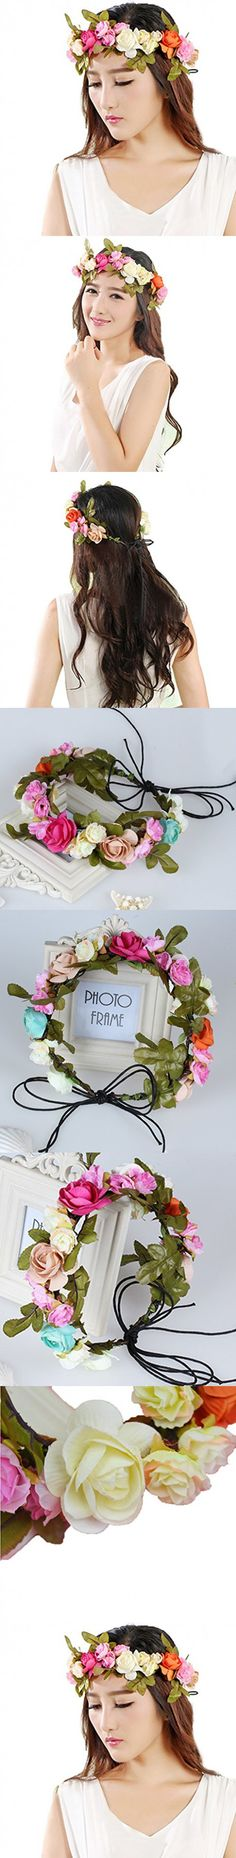 Vivivalue Floral Garland Flower Wreath Crown Headband with Ribbon Boho for Festival Wedding Multicoloured